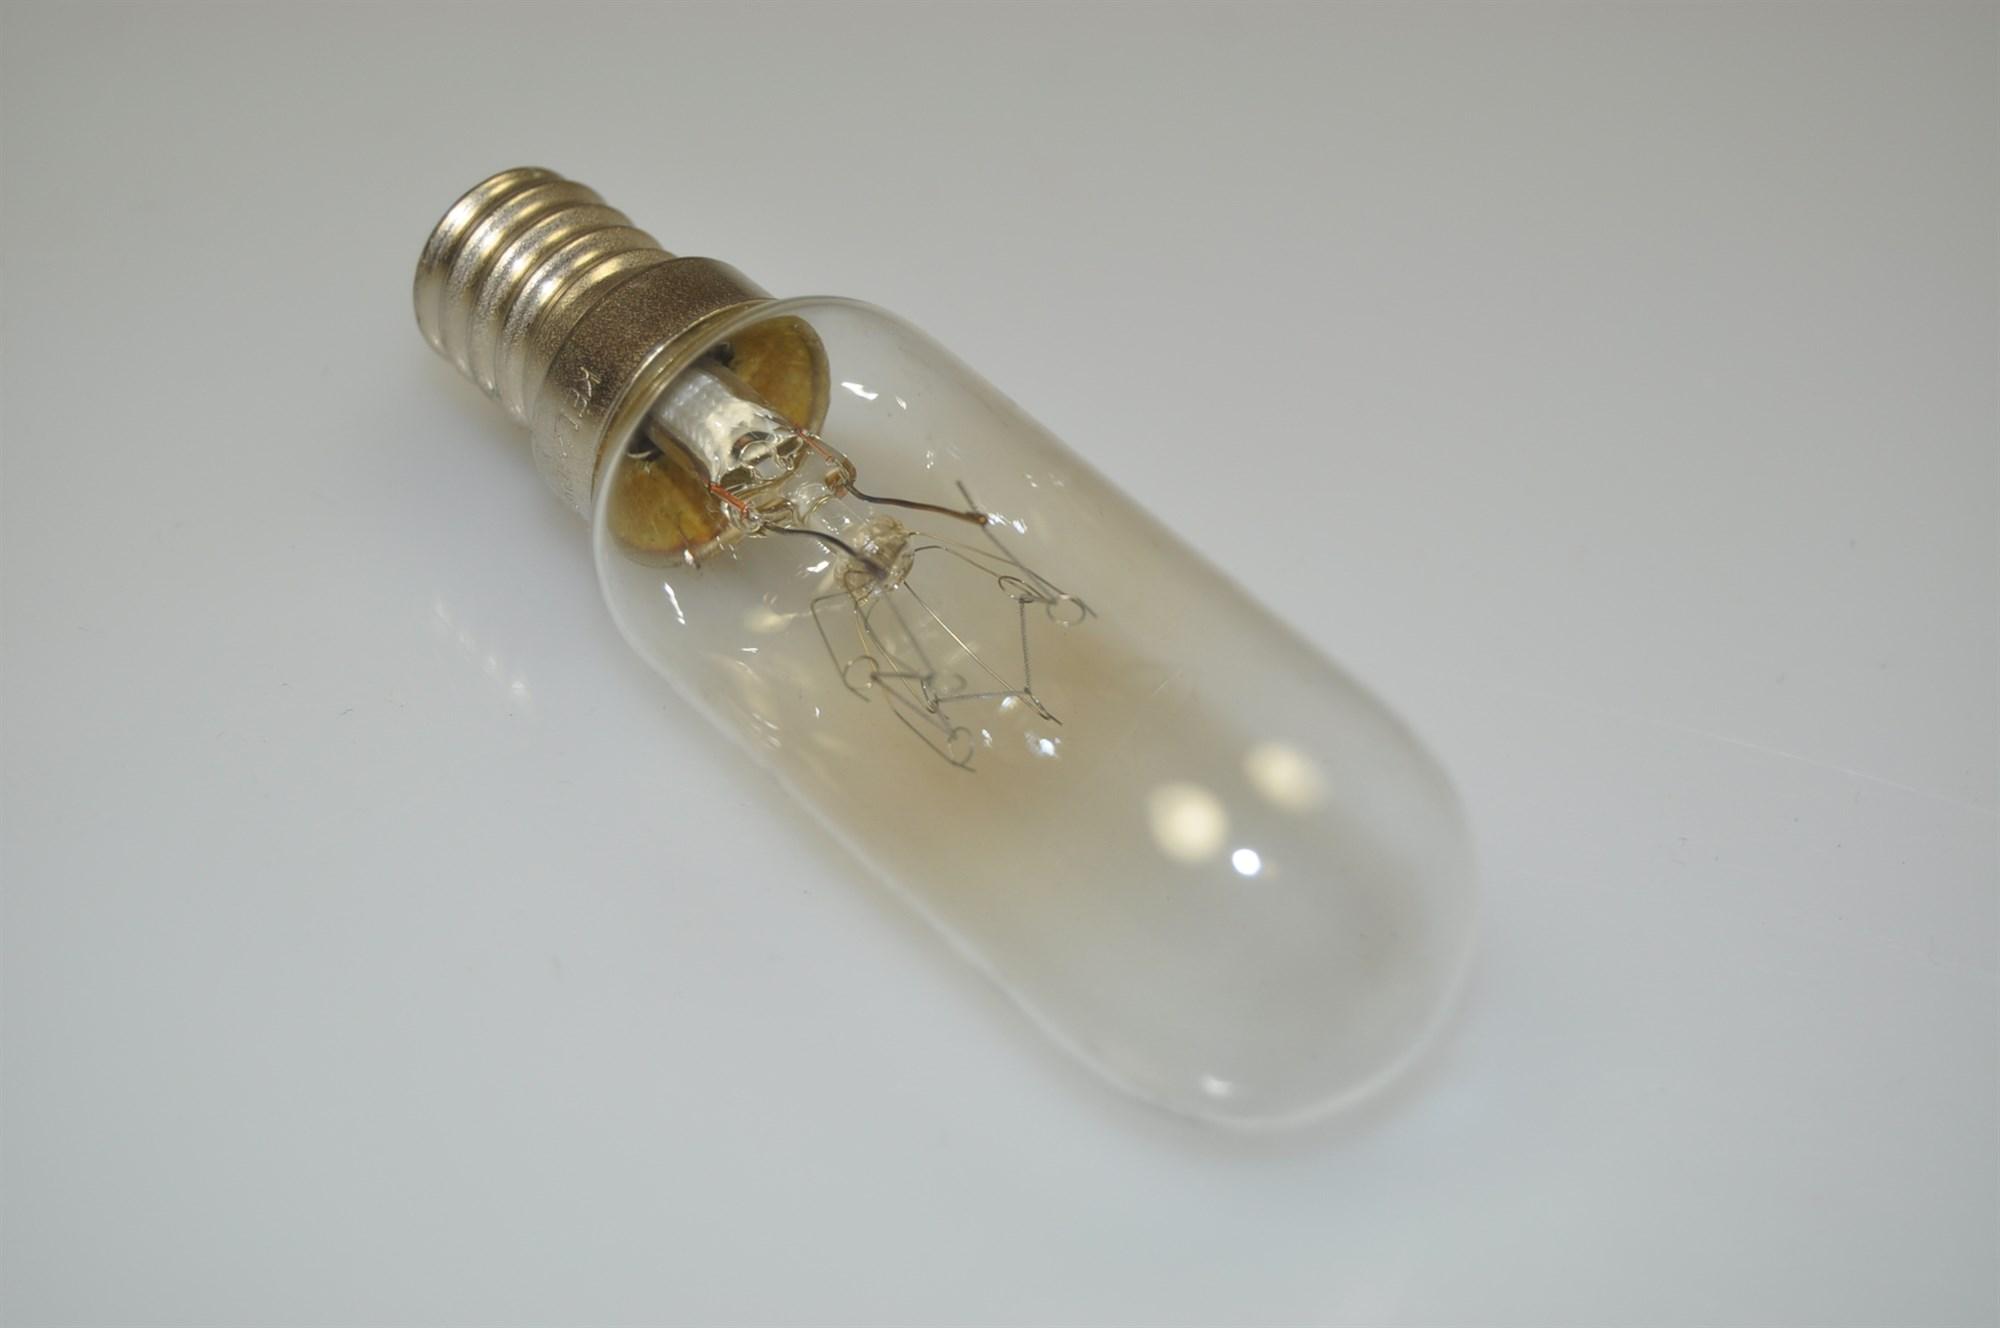 Kühlschrank Glühbirne : Glühbirne samsung side by side kühlschrank